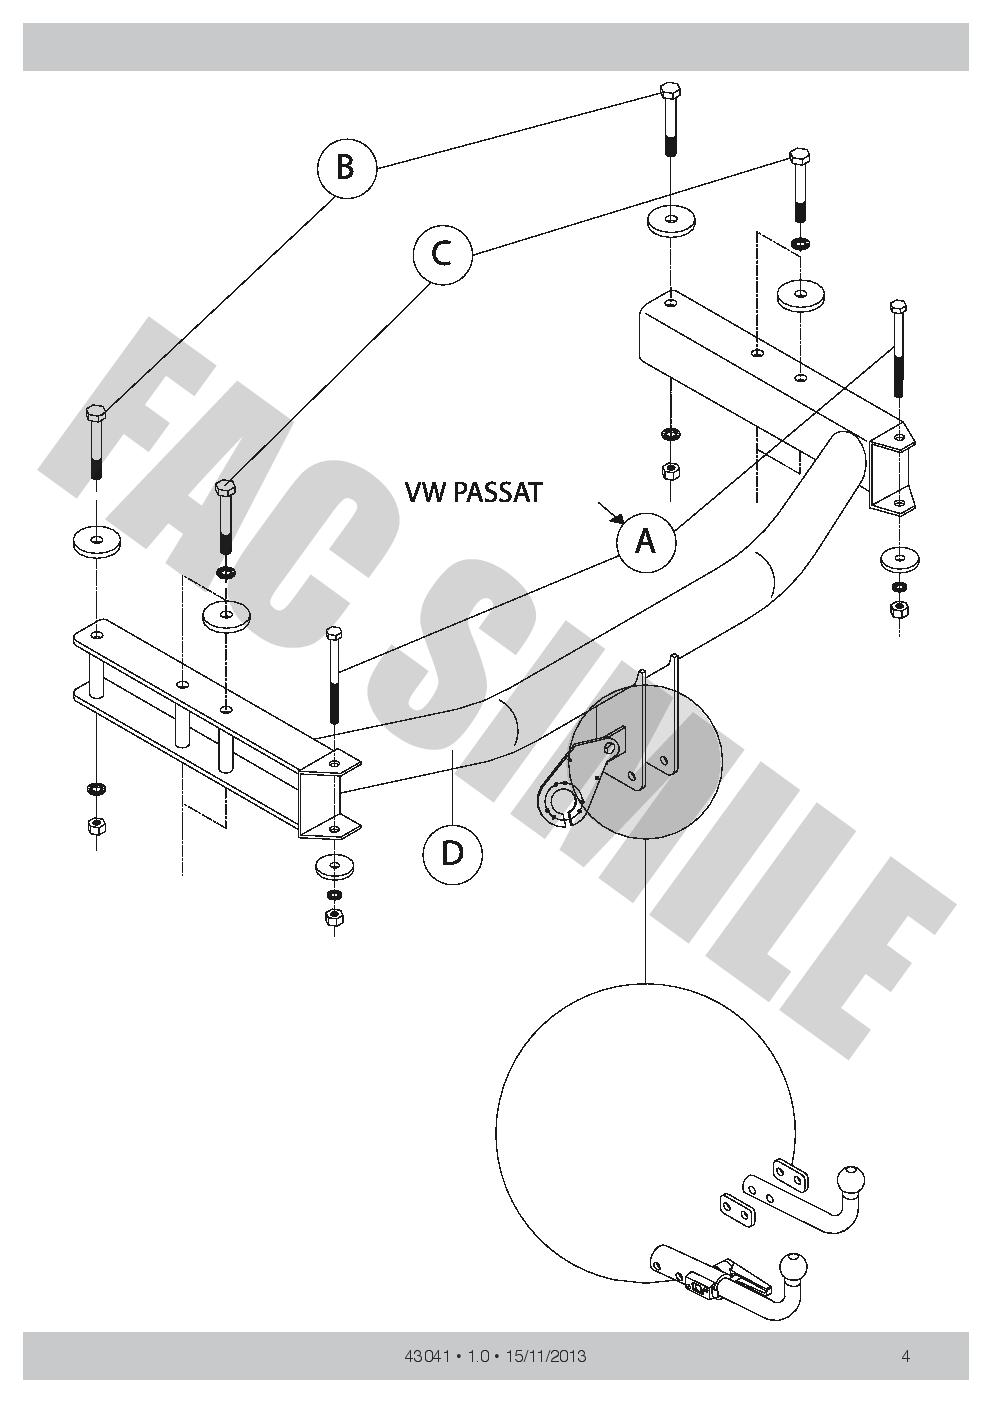 SKODA SUPERB 2002-2008 3U Saloon Detachable Towbar with Electric Kit 7Pin